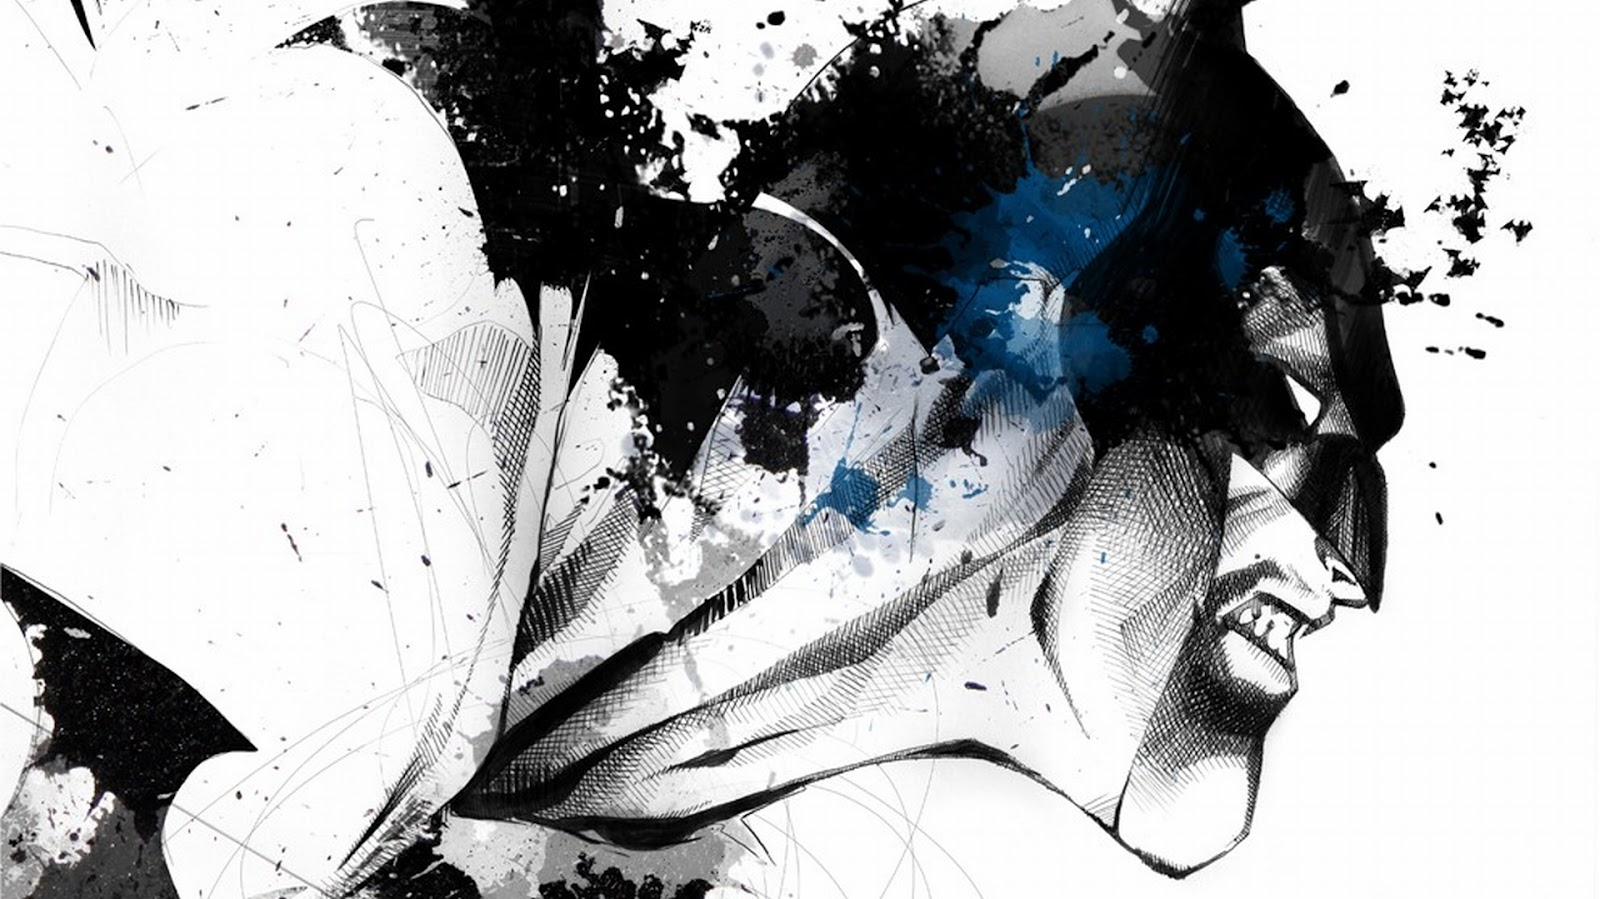 http://3.bp.blogspot.com/-9LSF4M0Iol8/UHbqiIBi2qI/AAAAAAAAC8A/7js7IpJJ8rk/s1600/Batman.jpg